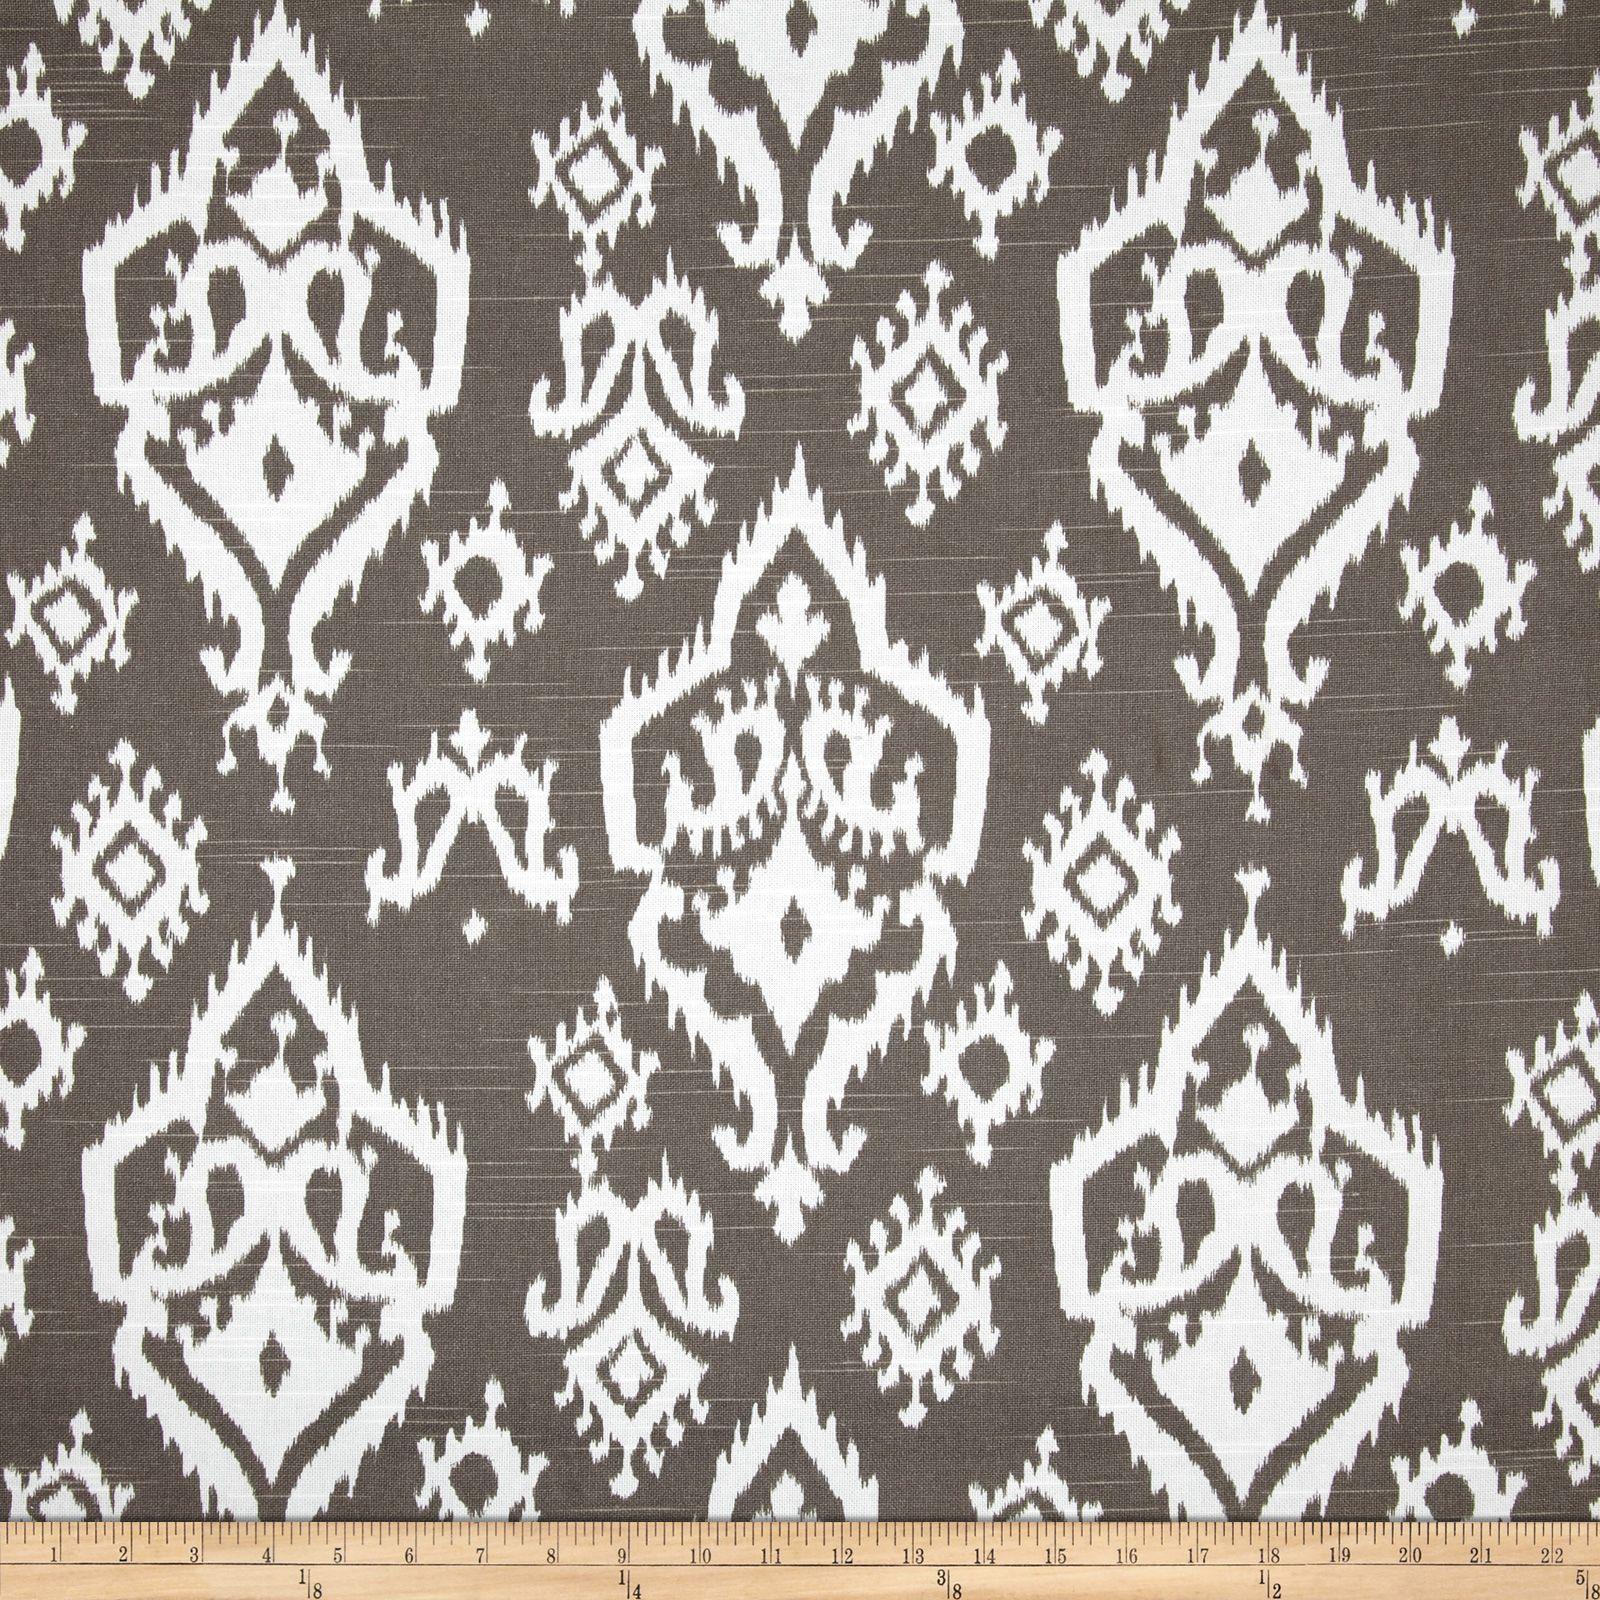 Premier Prints Raji Slub Spirit Brown Fabric